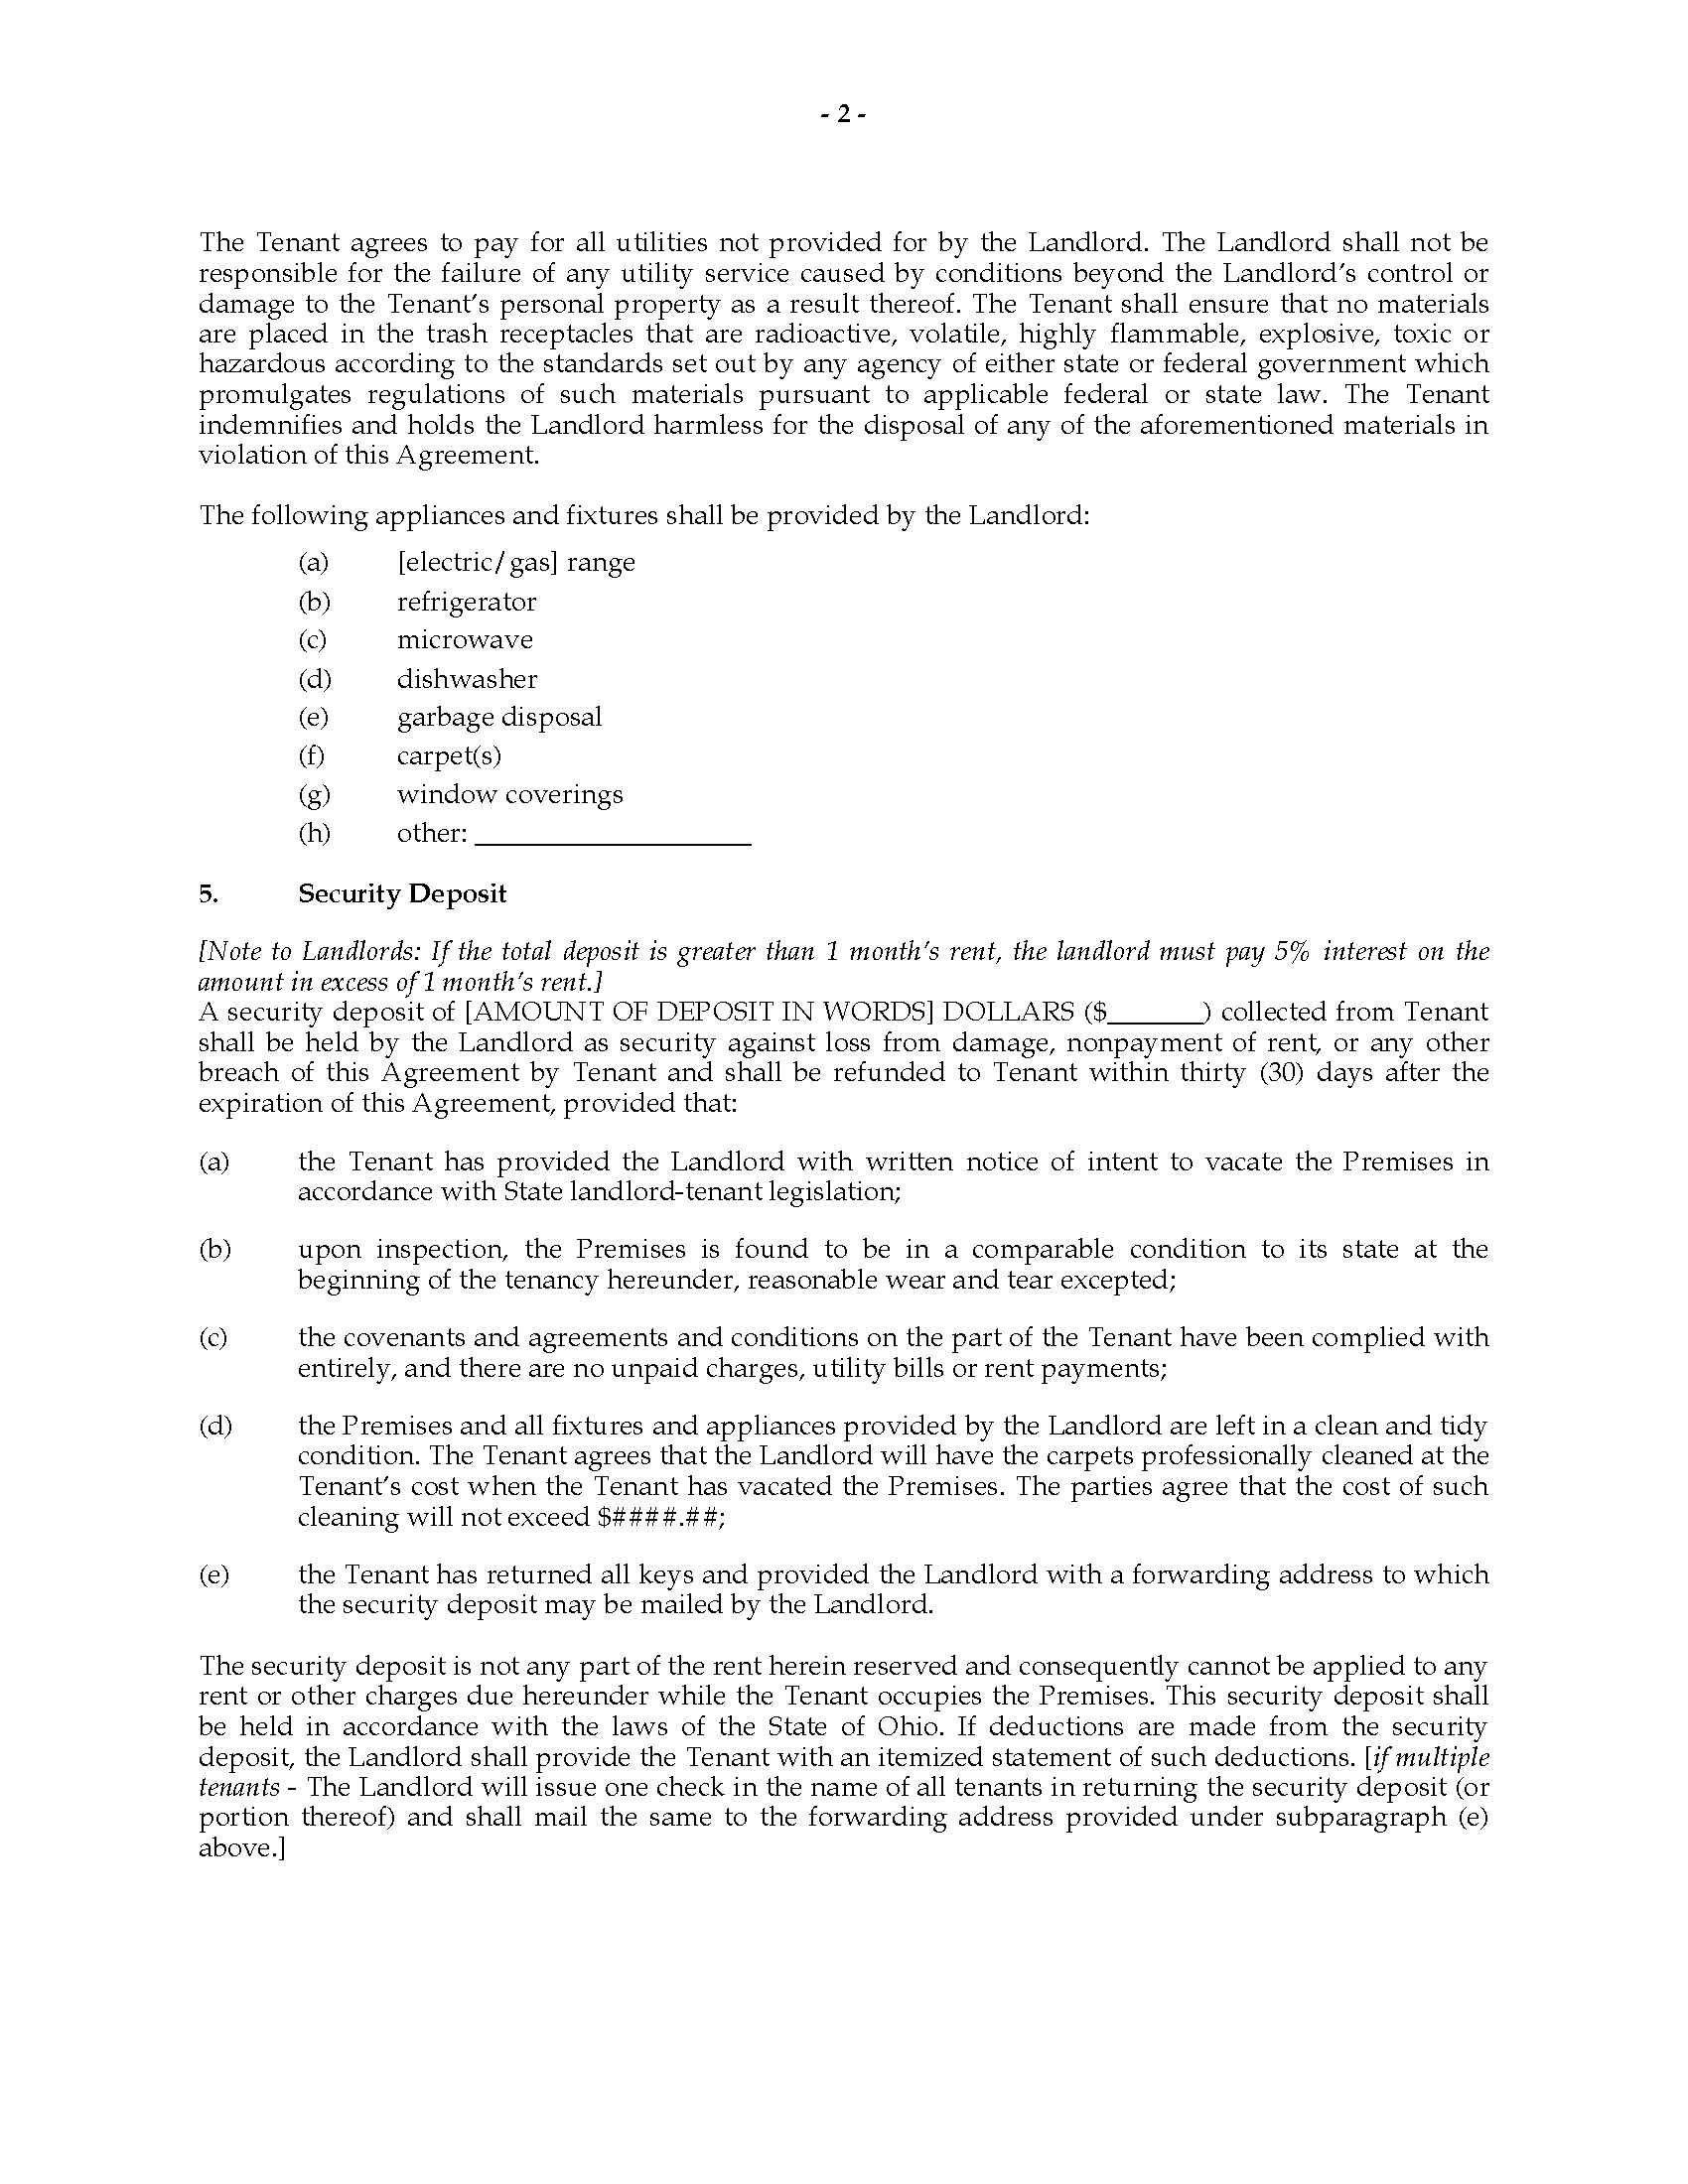 Residential Premises Lease Agreement Ichwobbledich